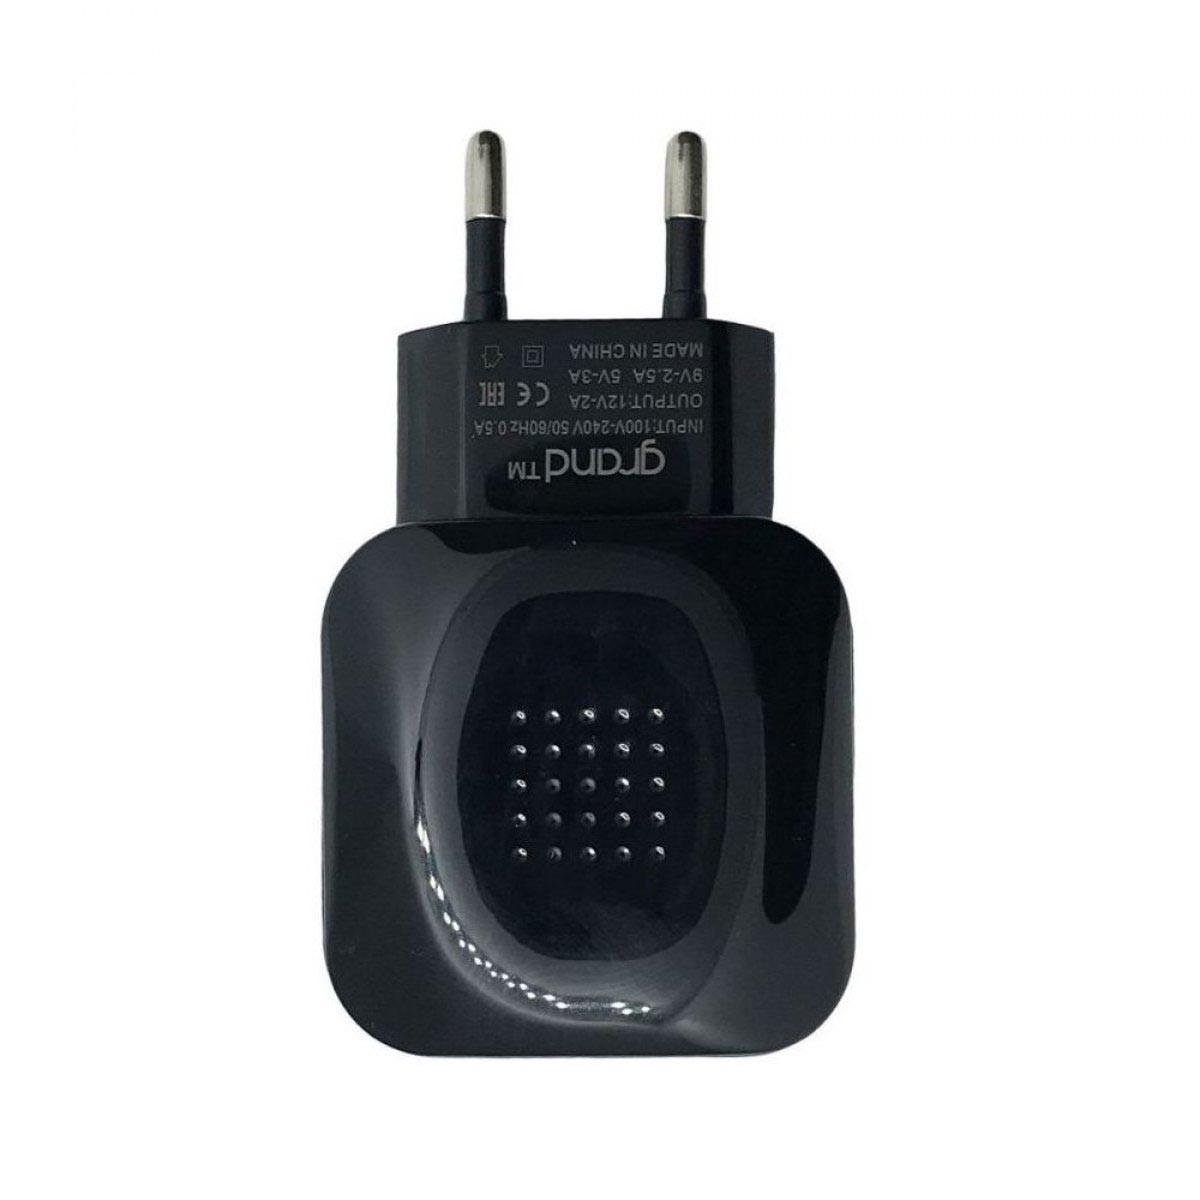 Grand GQ C01 Quick Charge 3.0 1xUSB